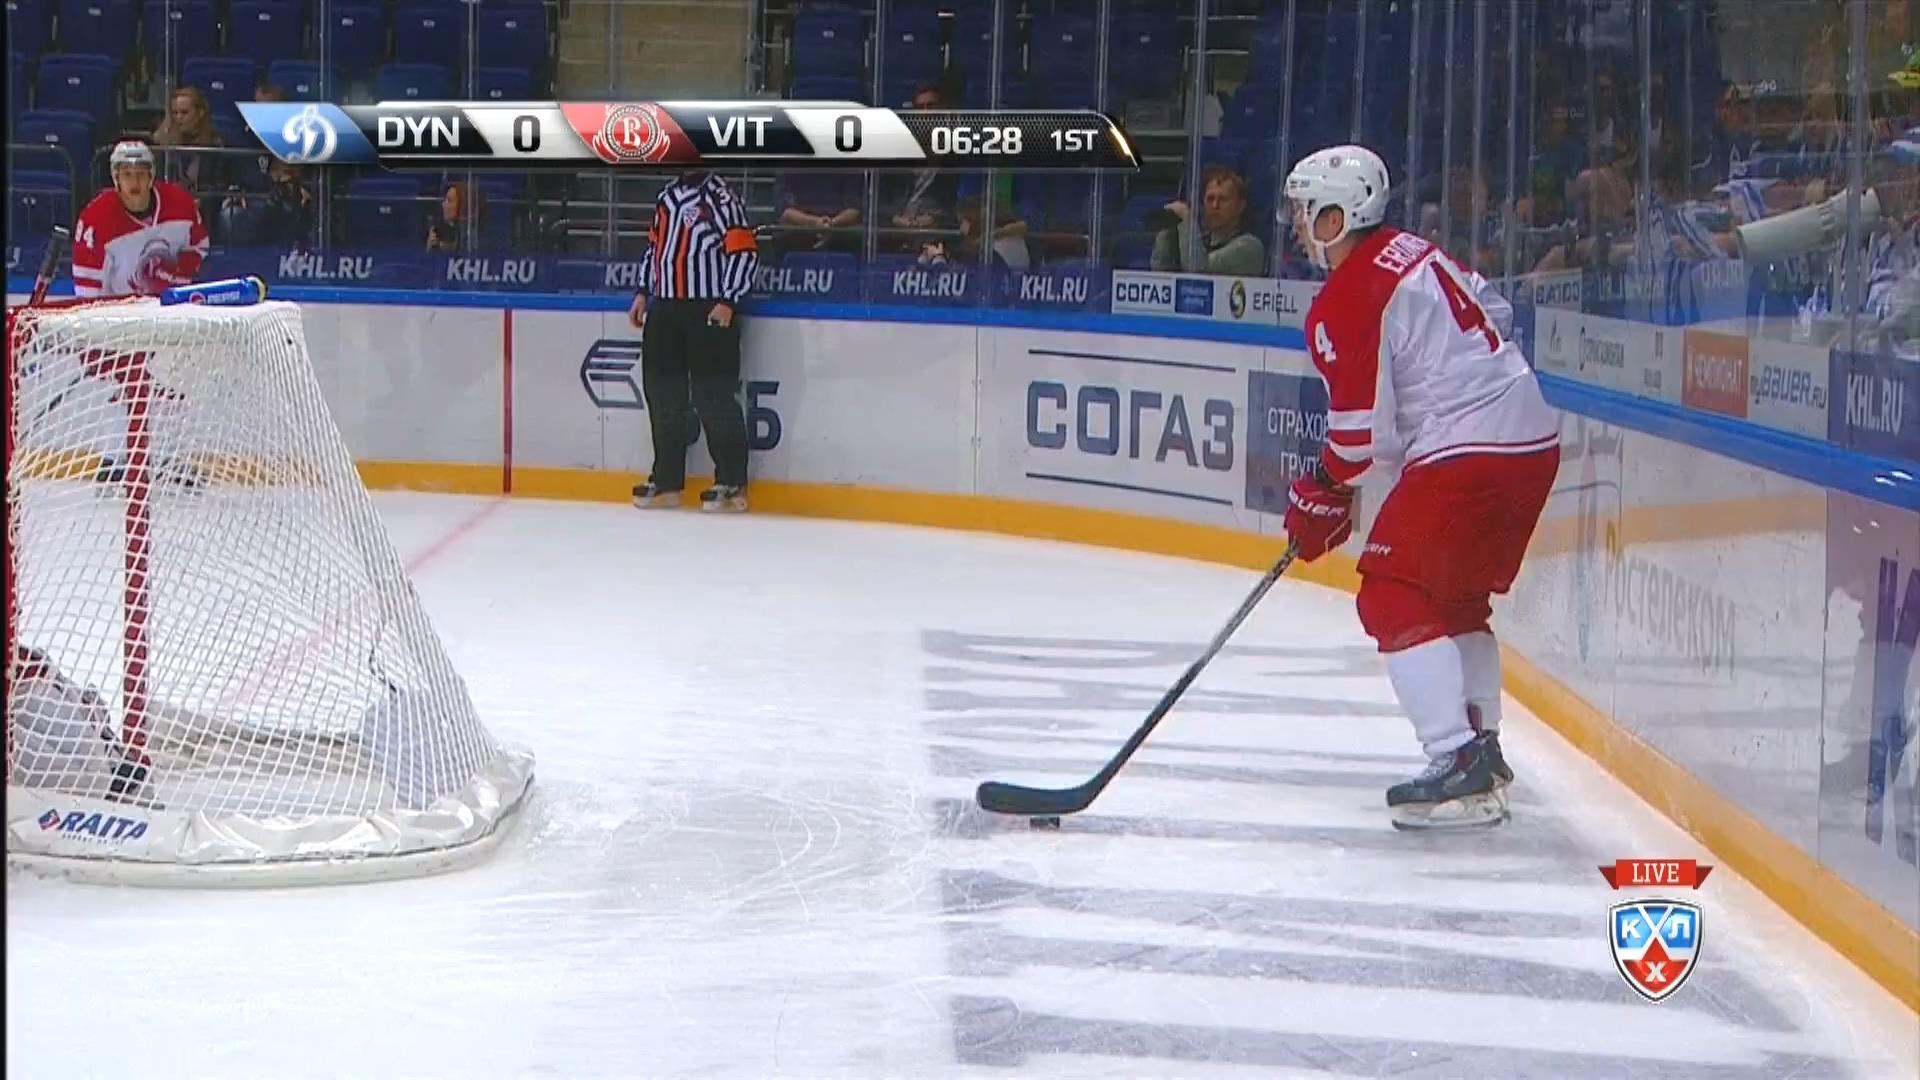 KHL.2015.09.04.DynM@Vityaz.1080p25.mkv_20150905_154807.609.jpg